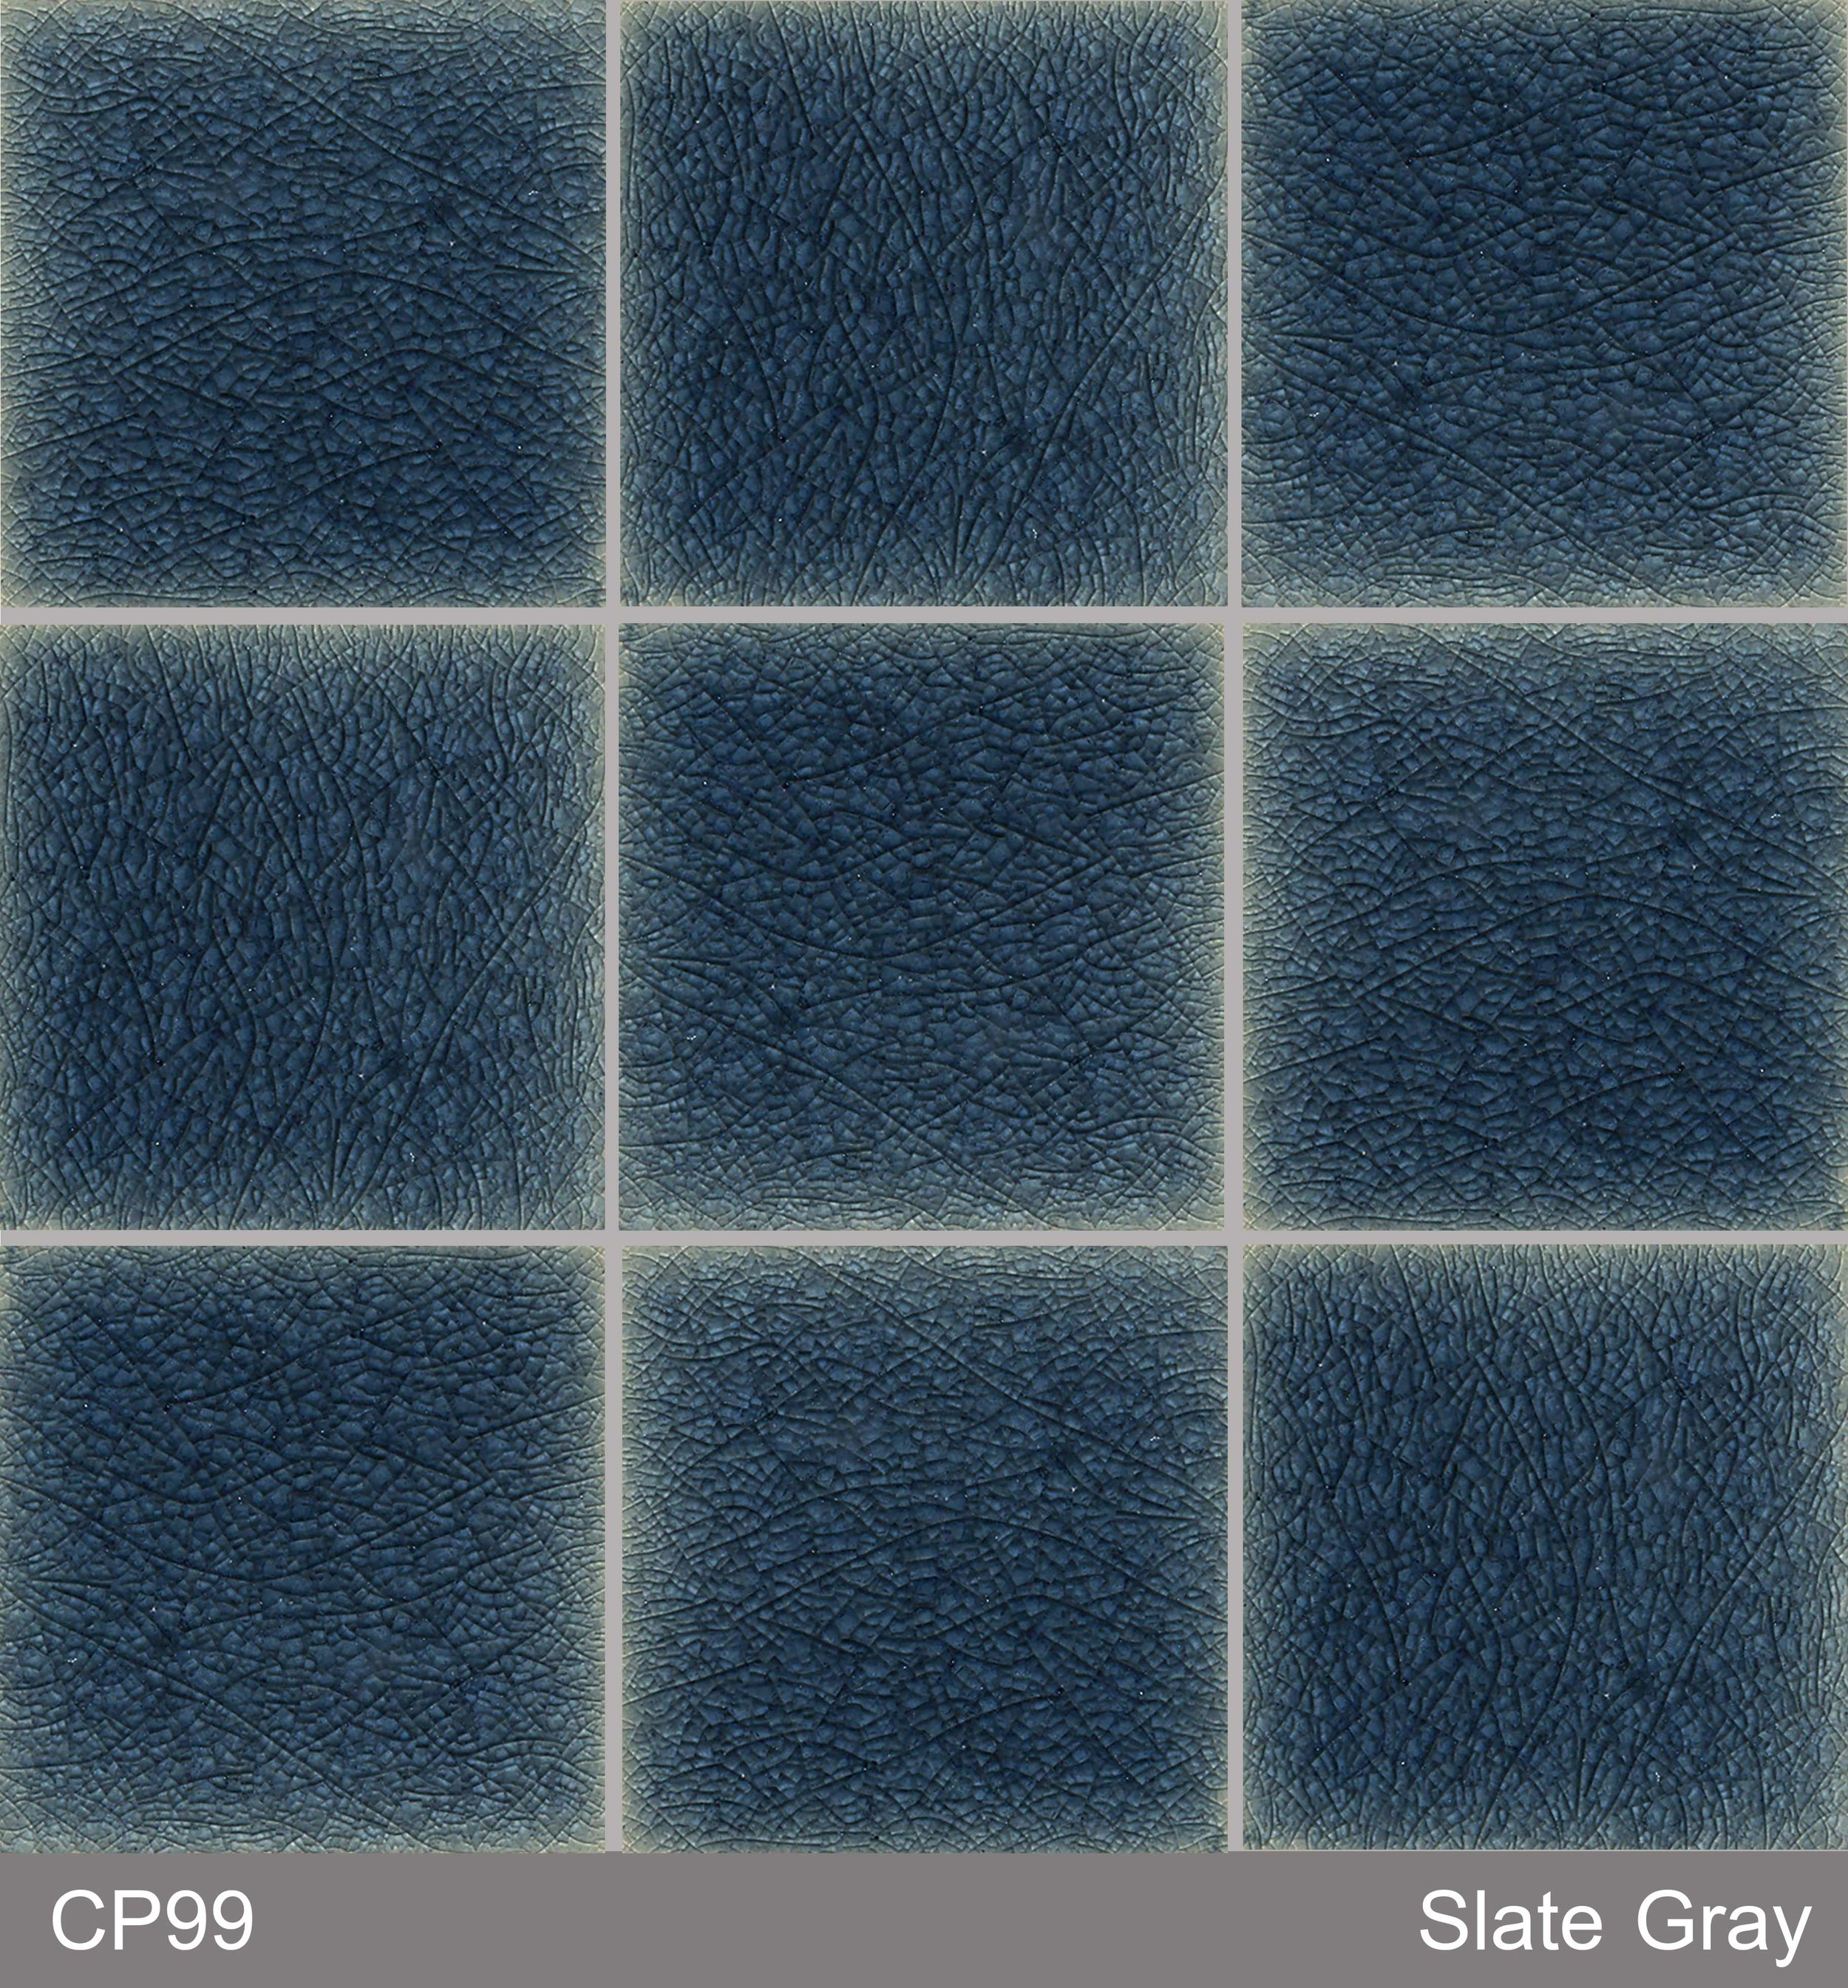 CP99 : Slate gray